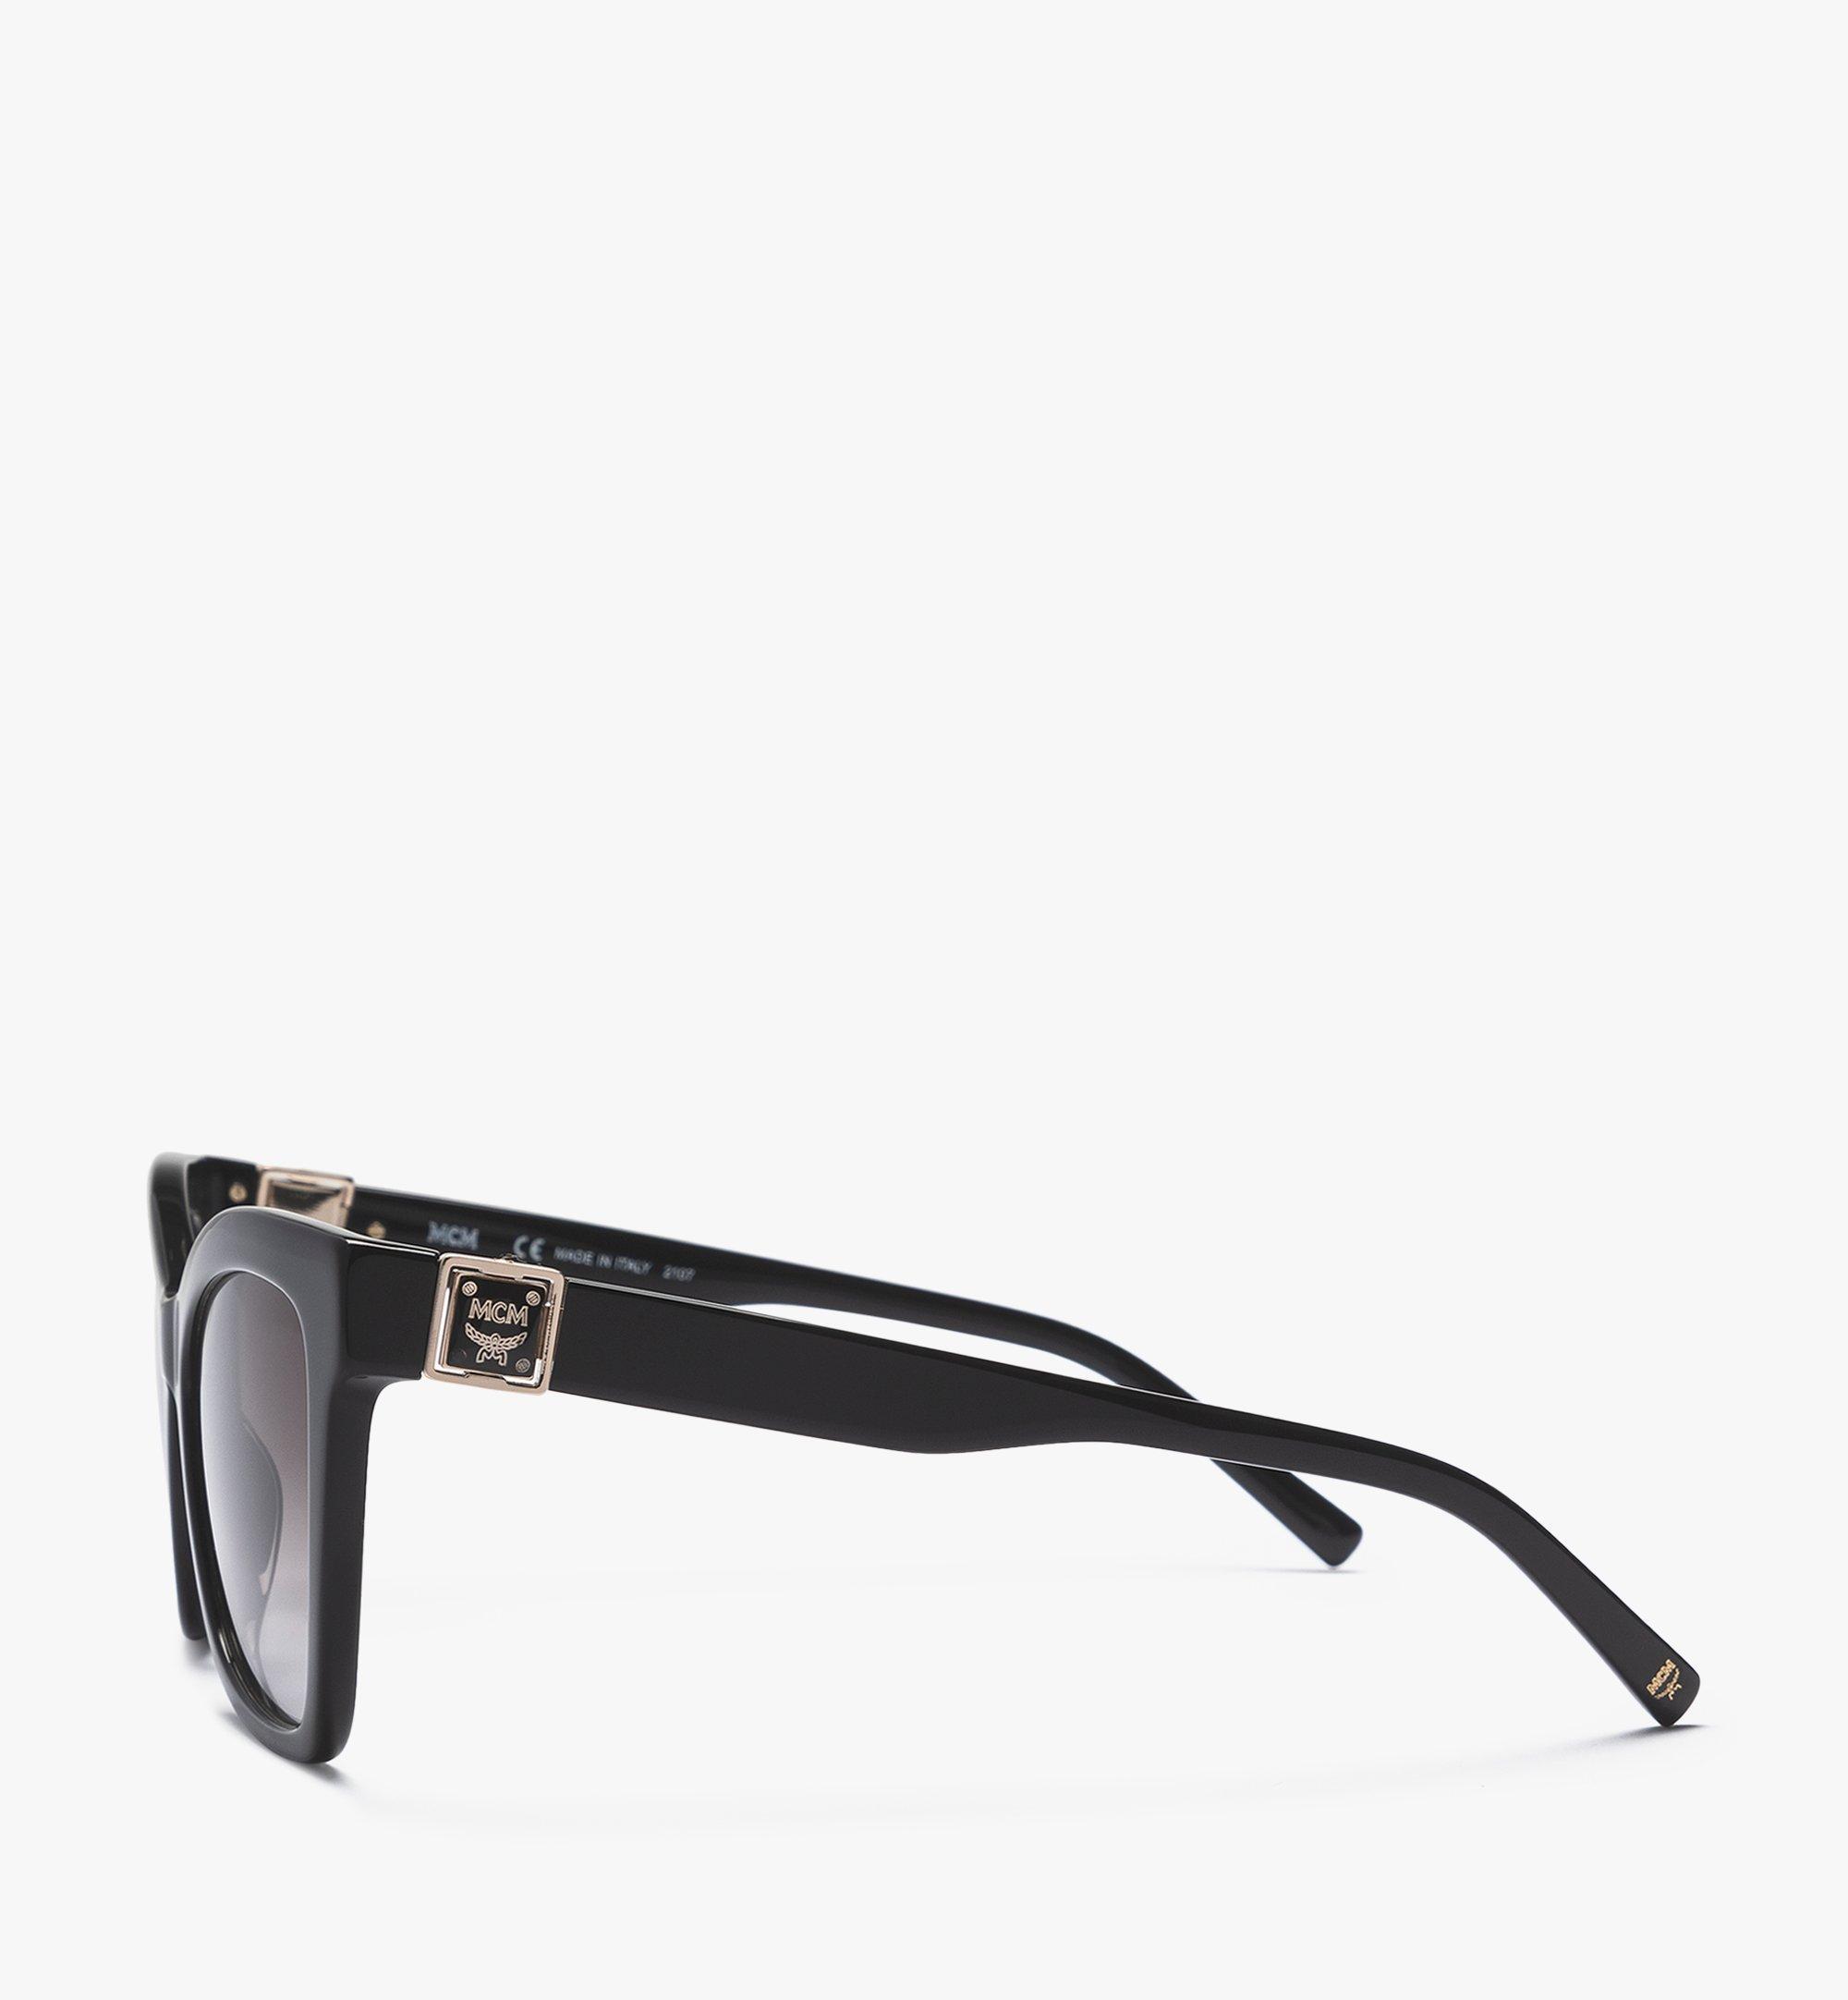 MCM MCM712S Butterfly Sunglasses Black MEGBAMM08BK001 Alternate View 1